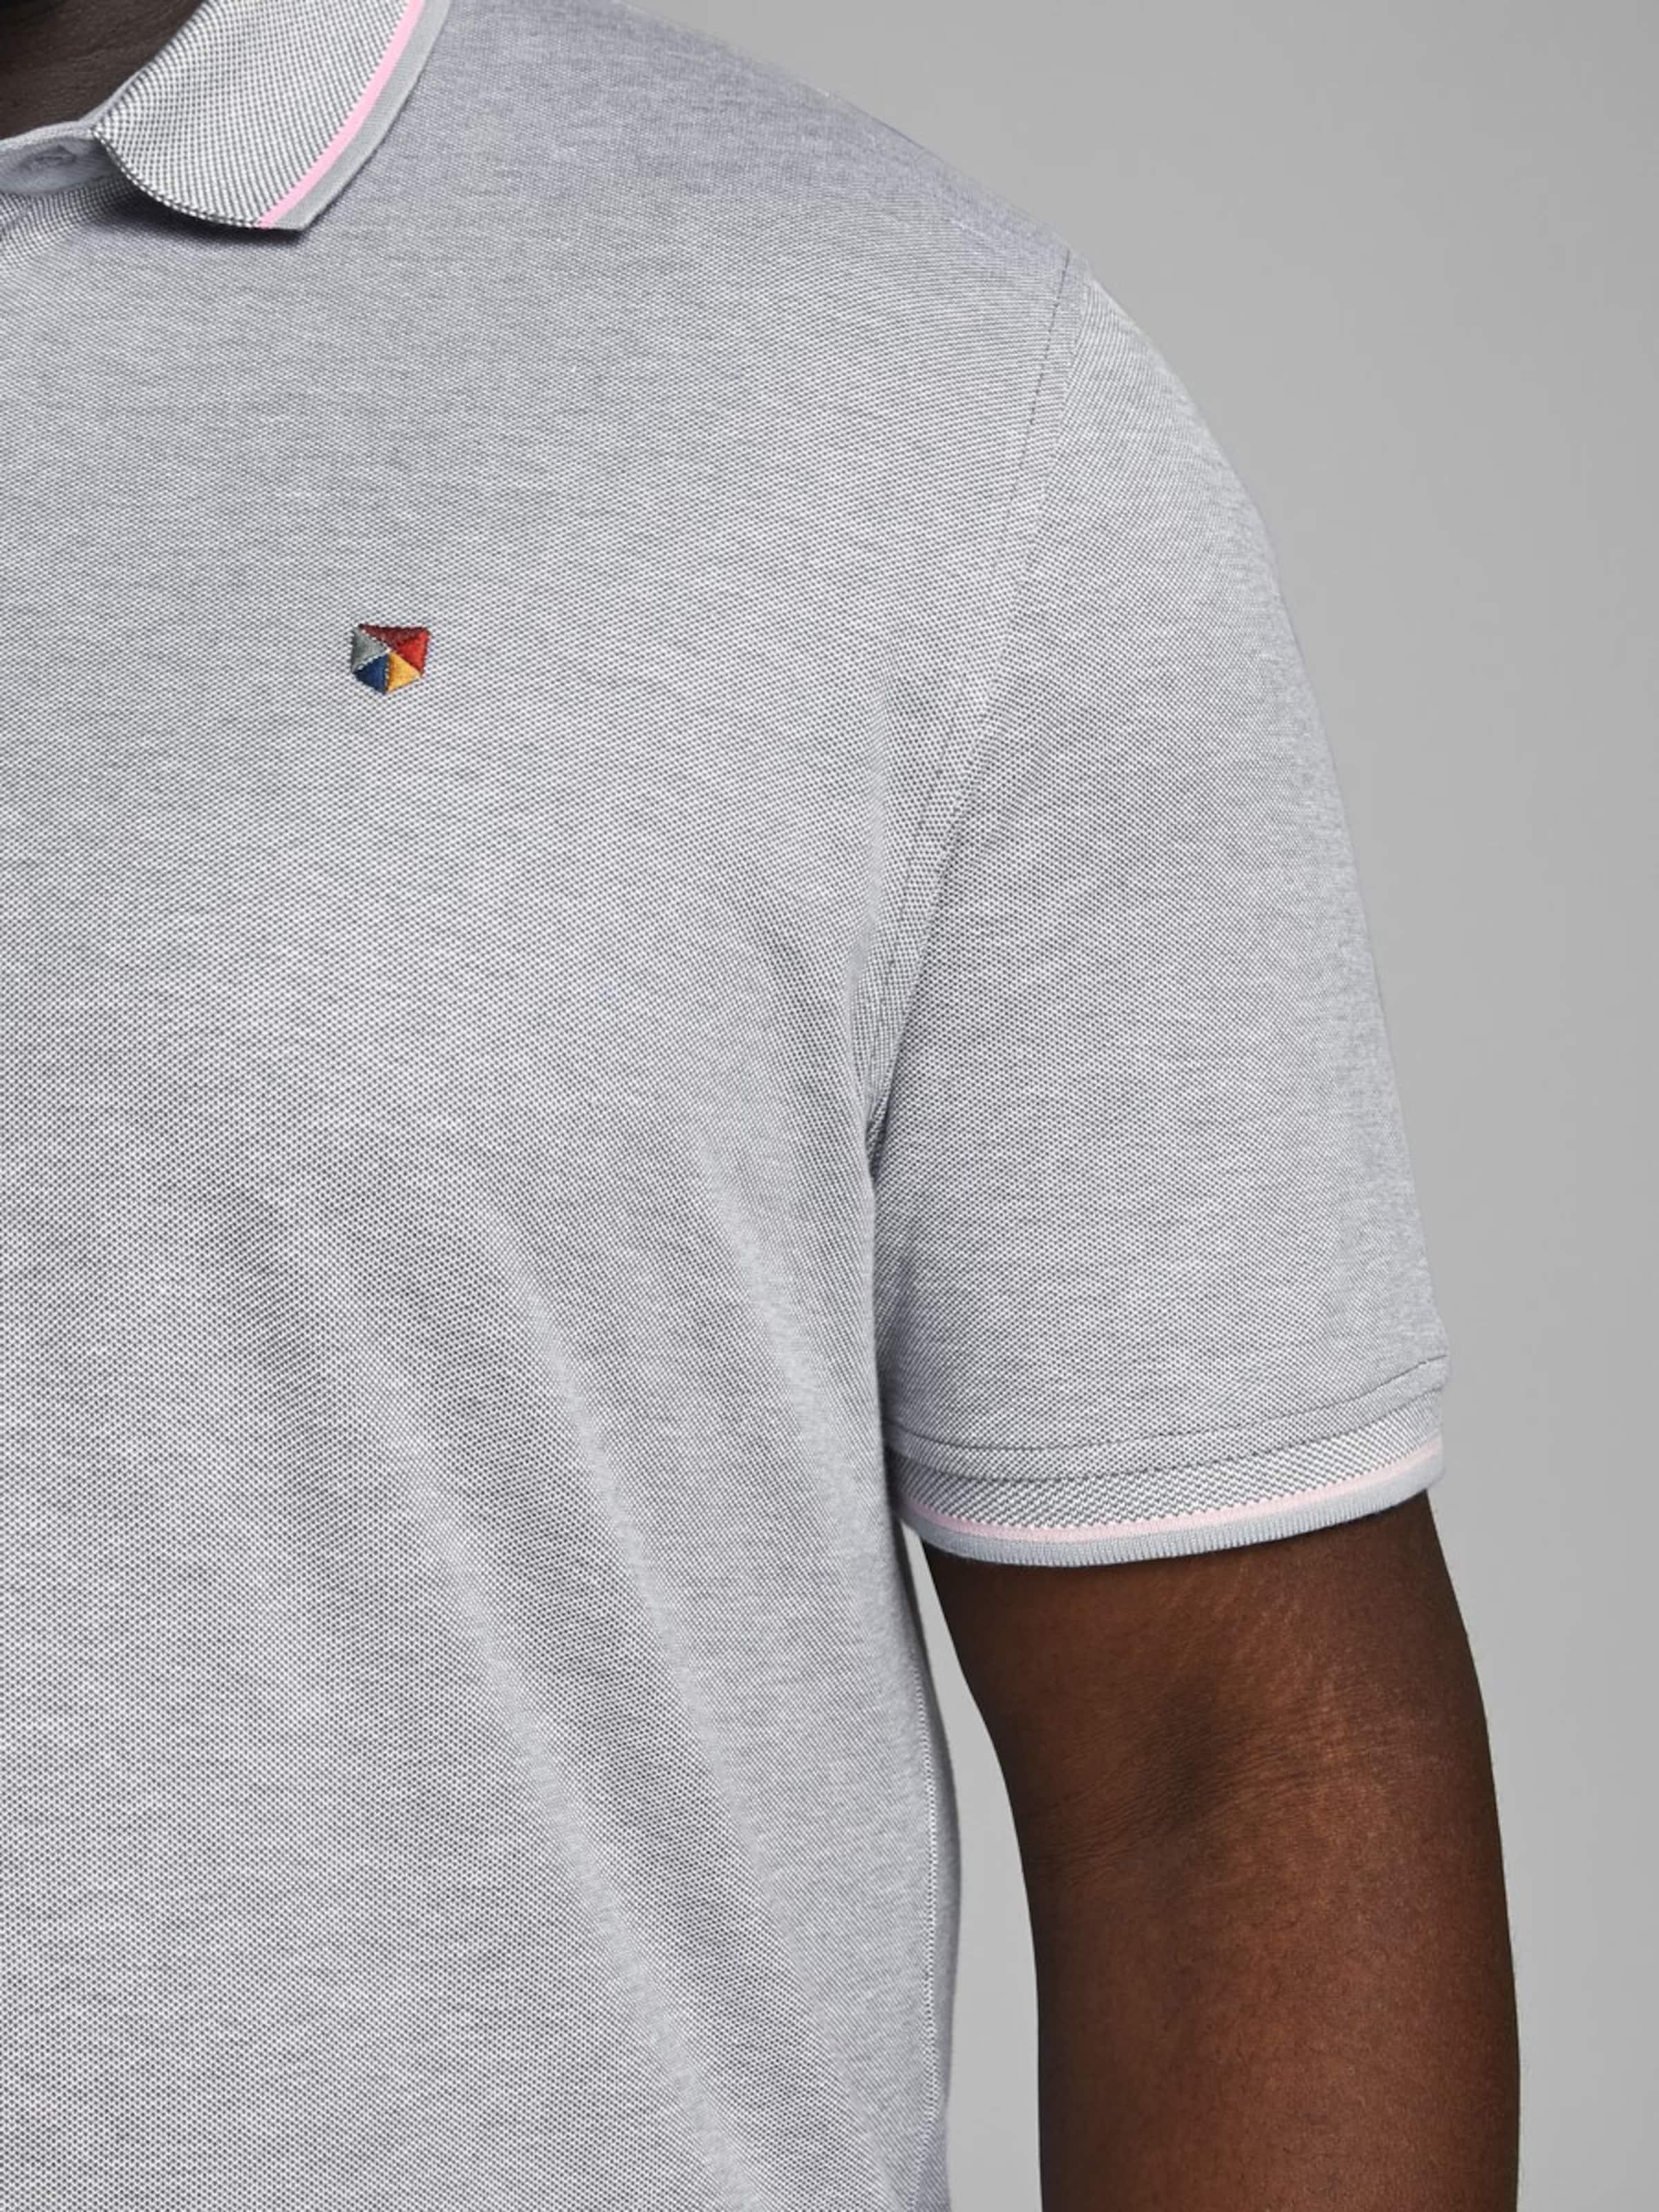 GrauPink Jones shirt In Jackamp; T CeWrdxBo